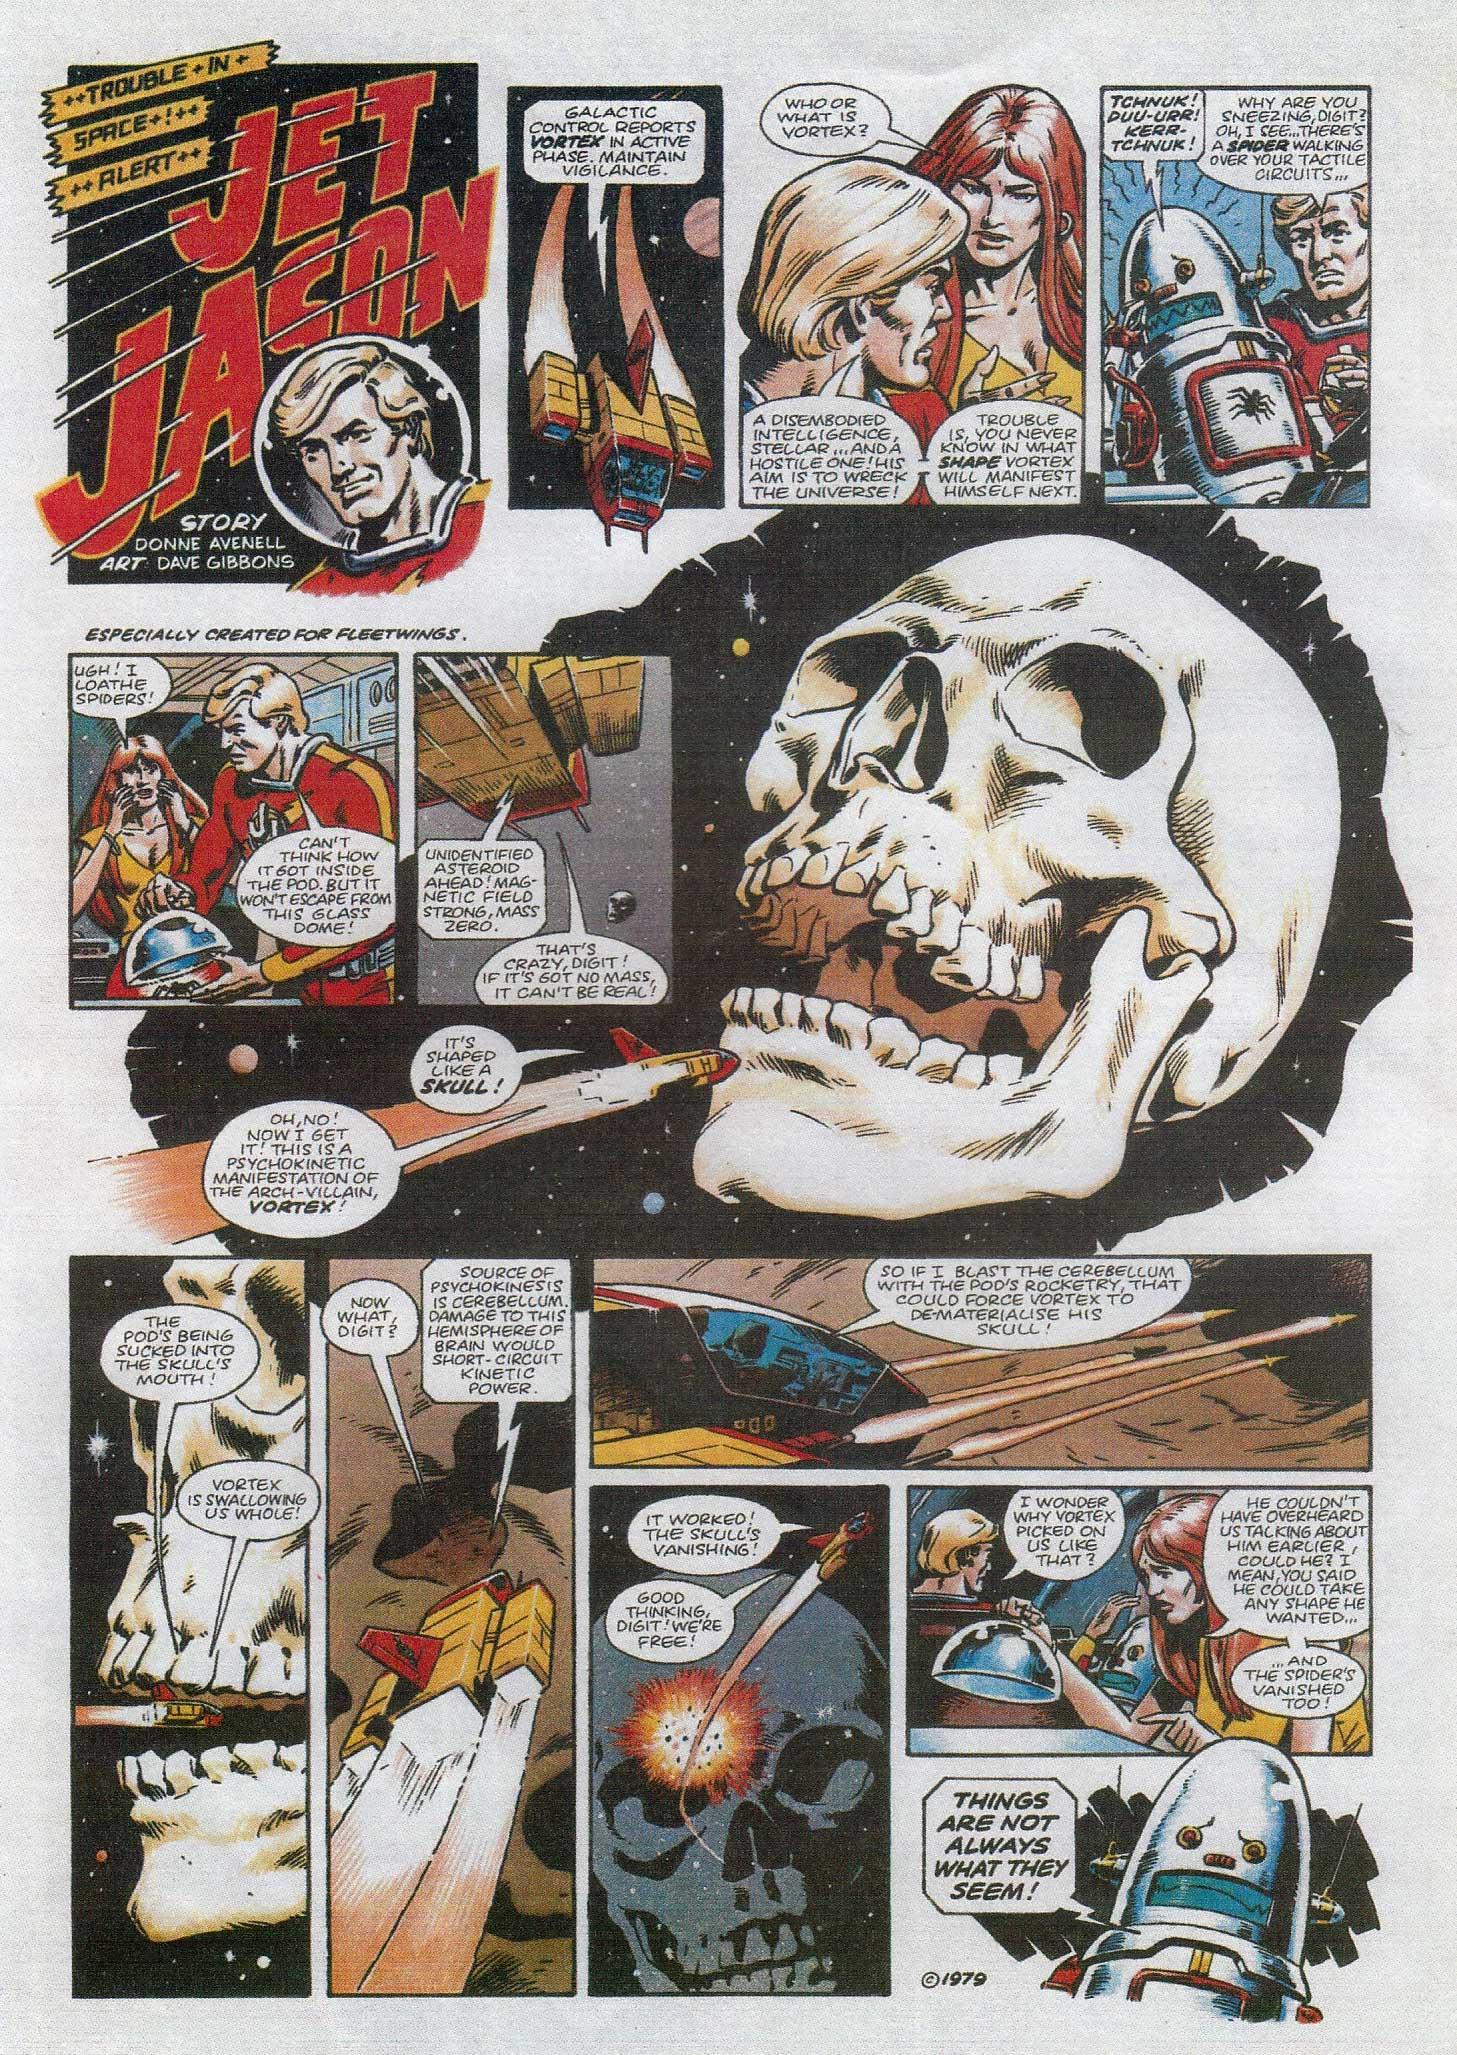 Jet Jason for Fleetwings - Spring 1980